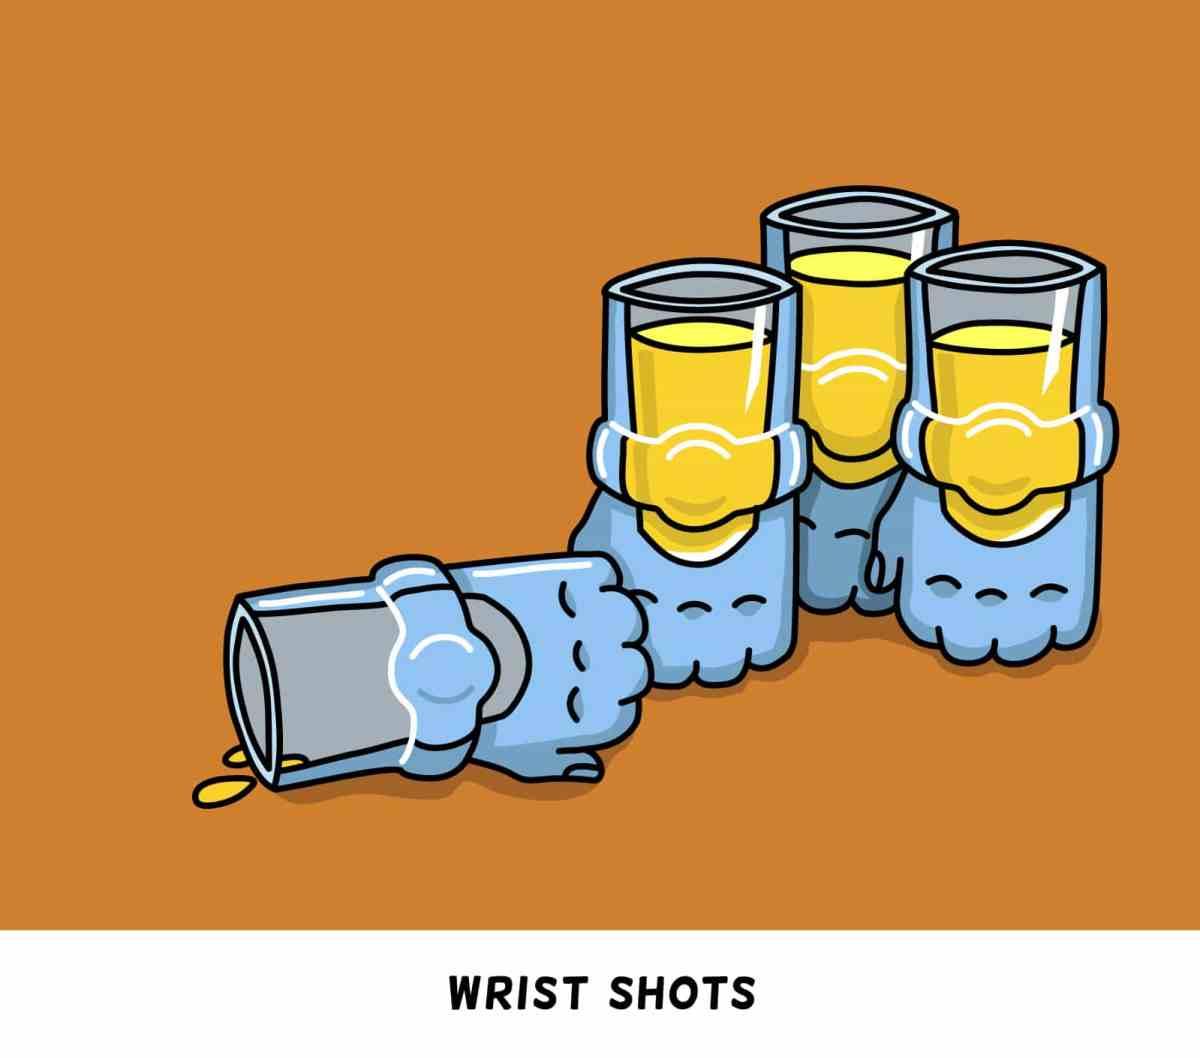 Wrist shots